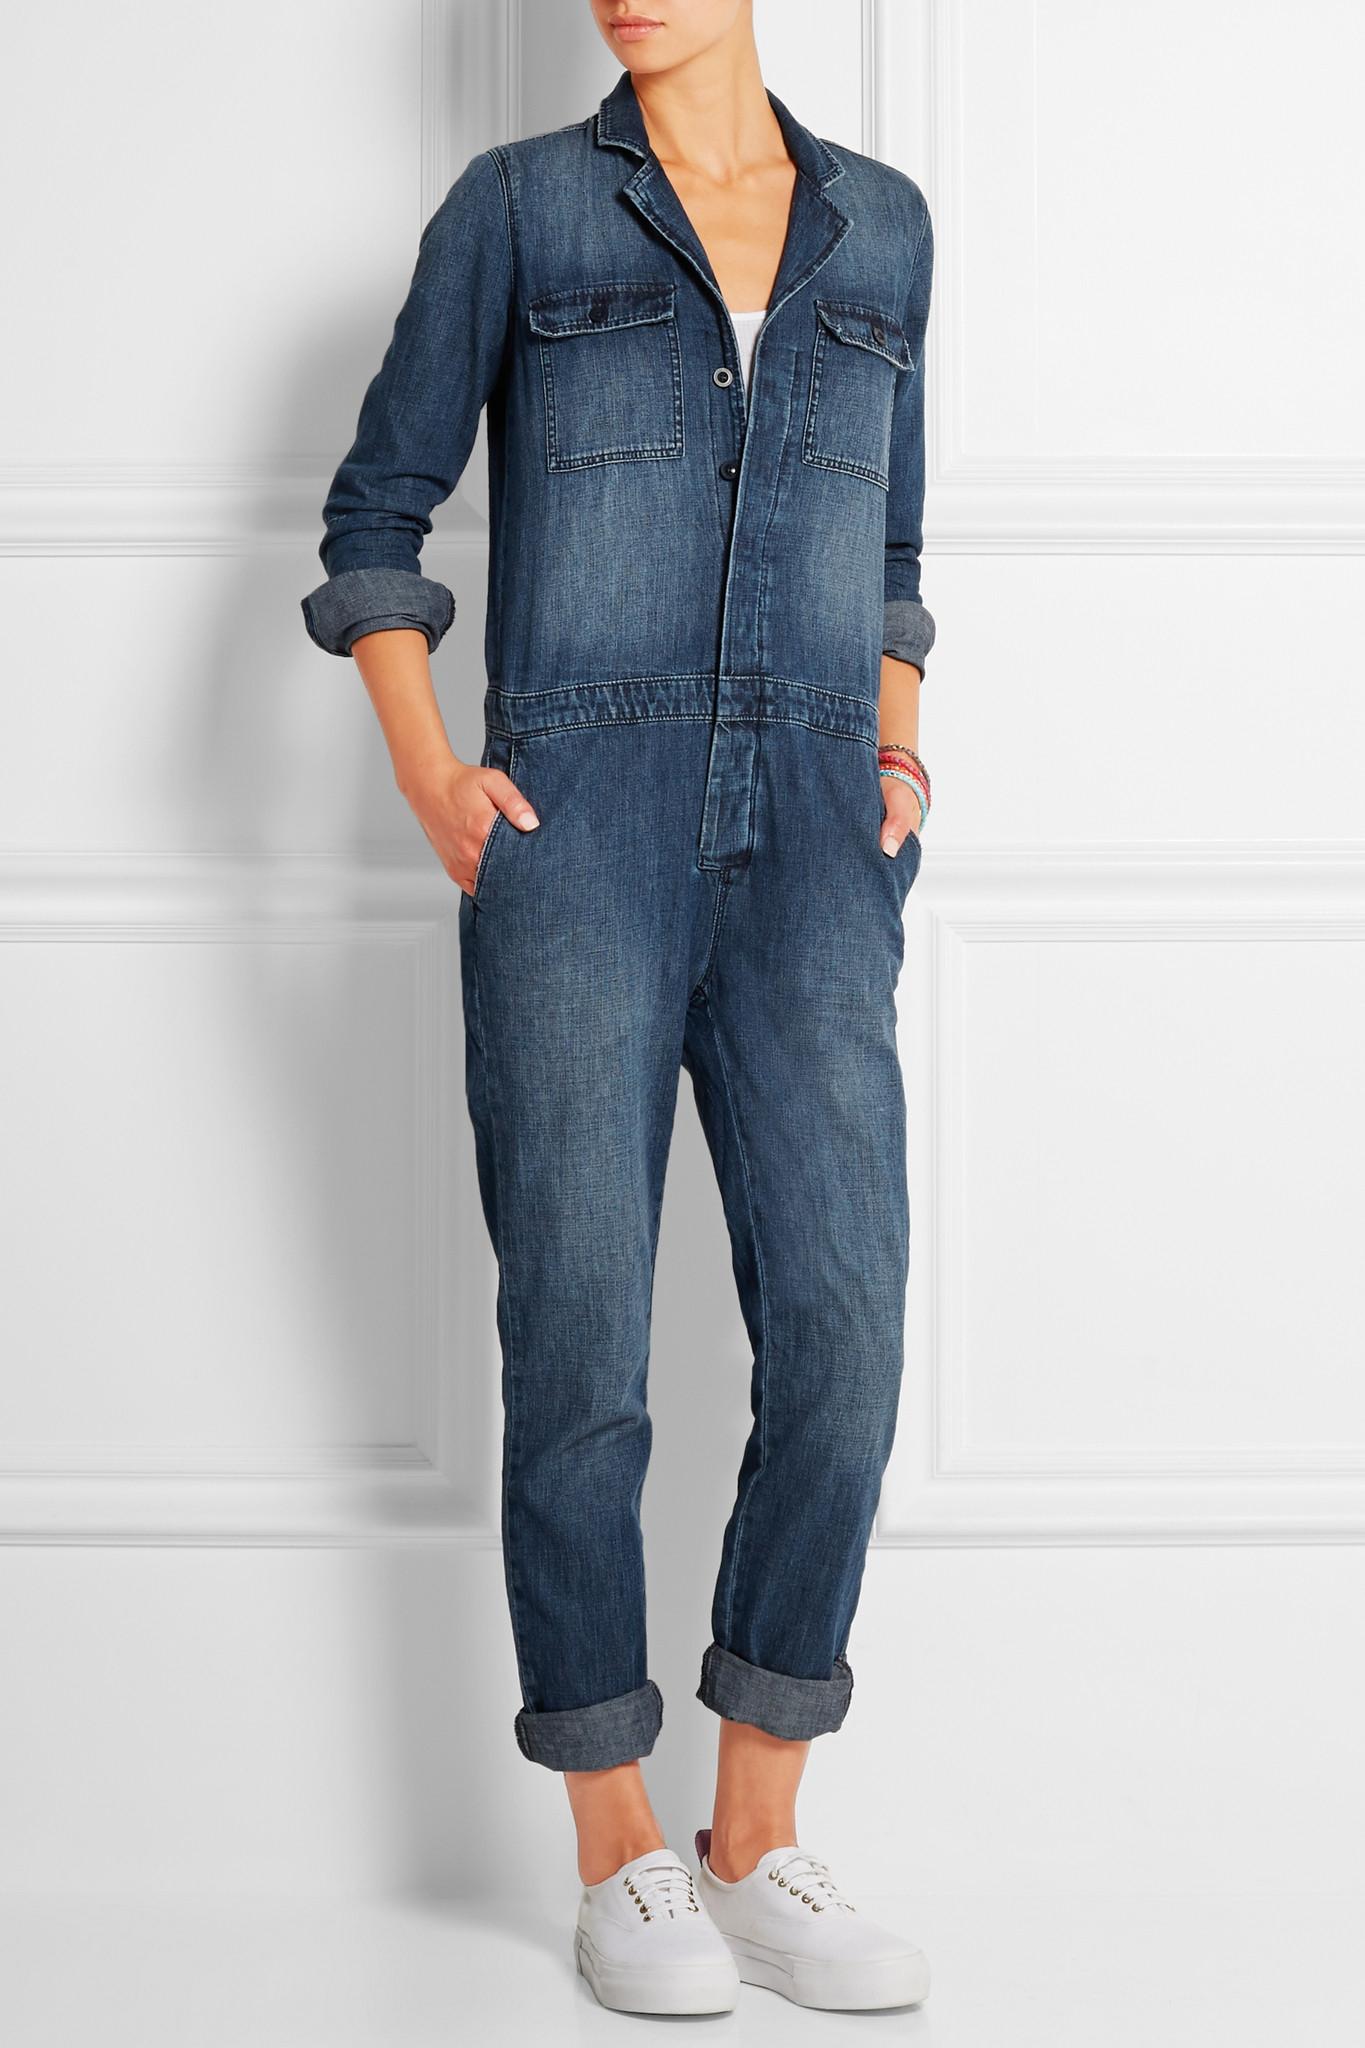 1d9a853ba0c Madewell Denim Jumpsuit in Blue - Lyst